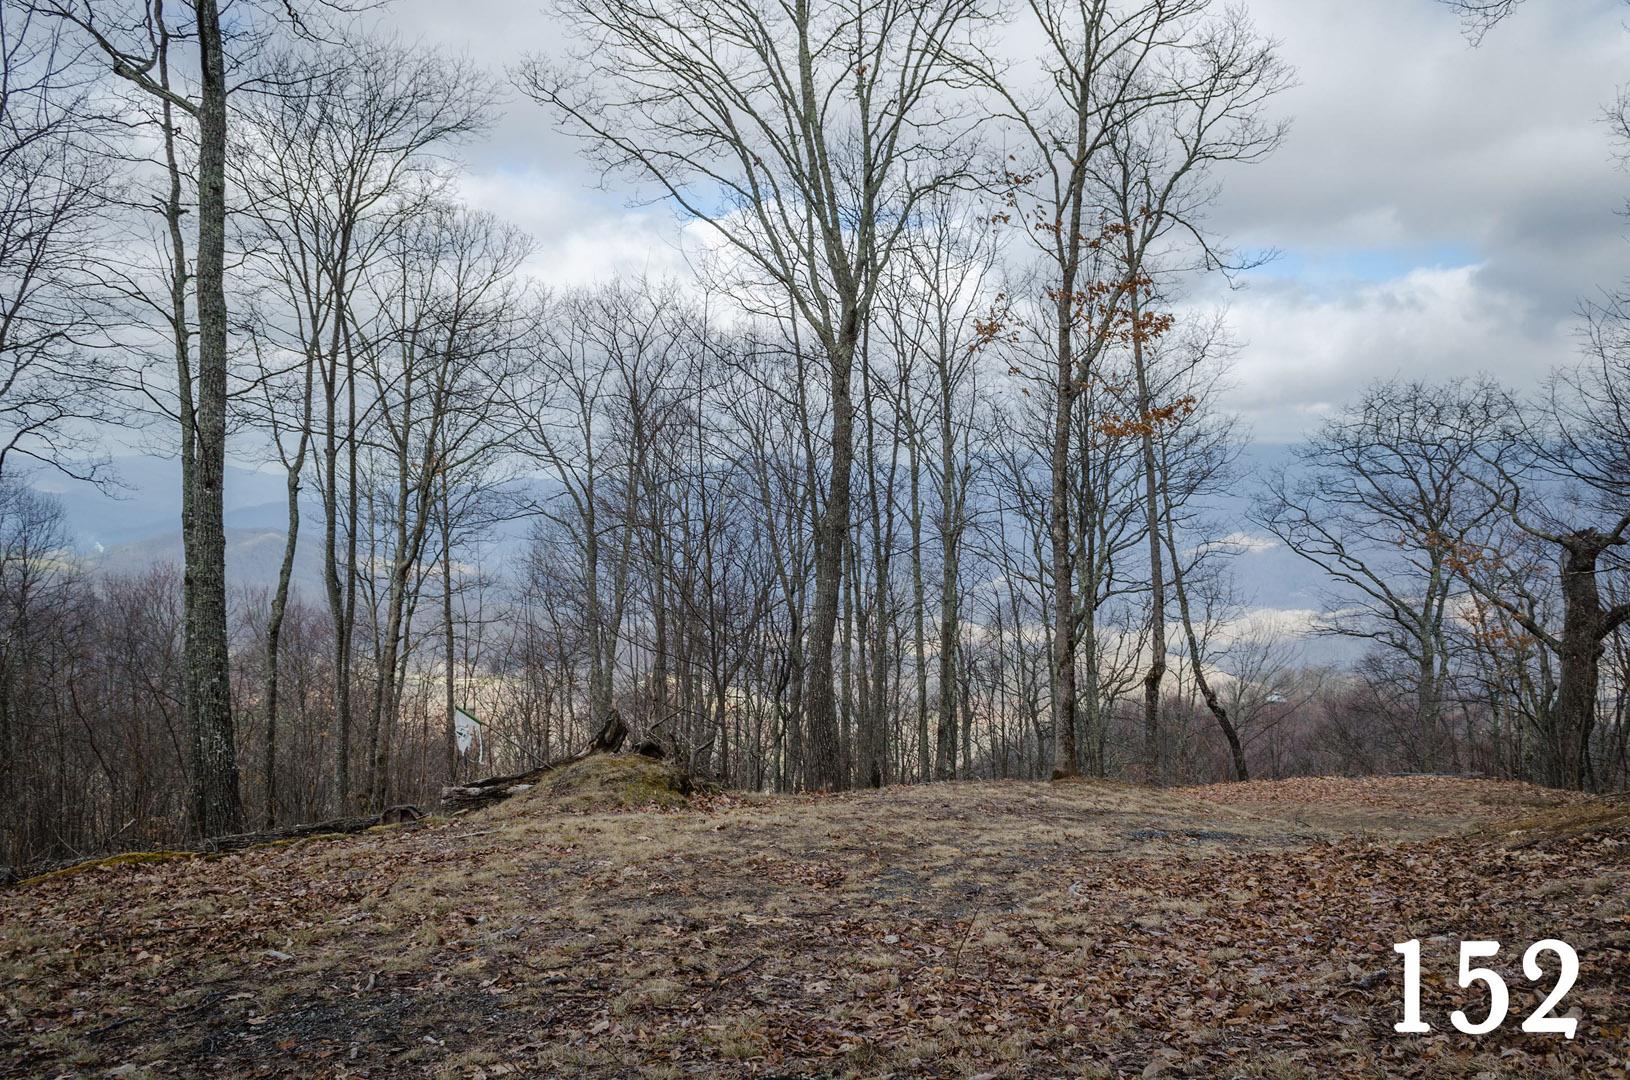 Balsam mountain preserve lot 152 balsam mountain preserve for Balsam mountain